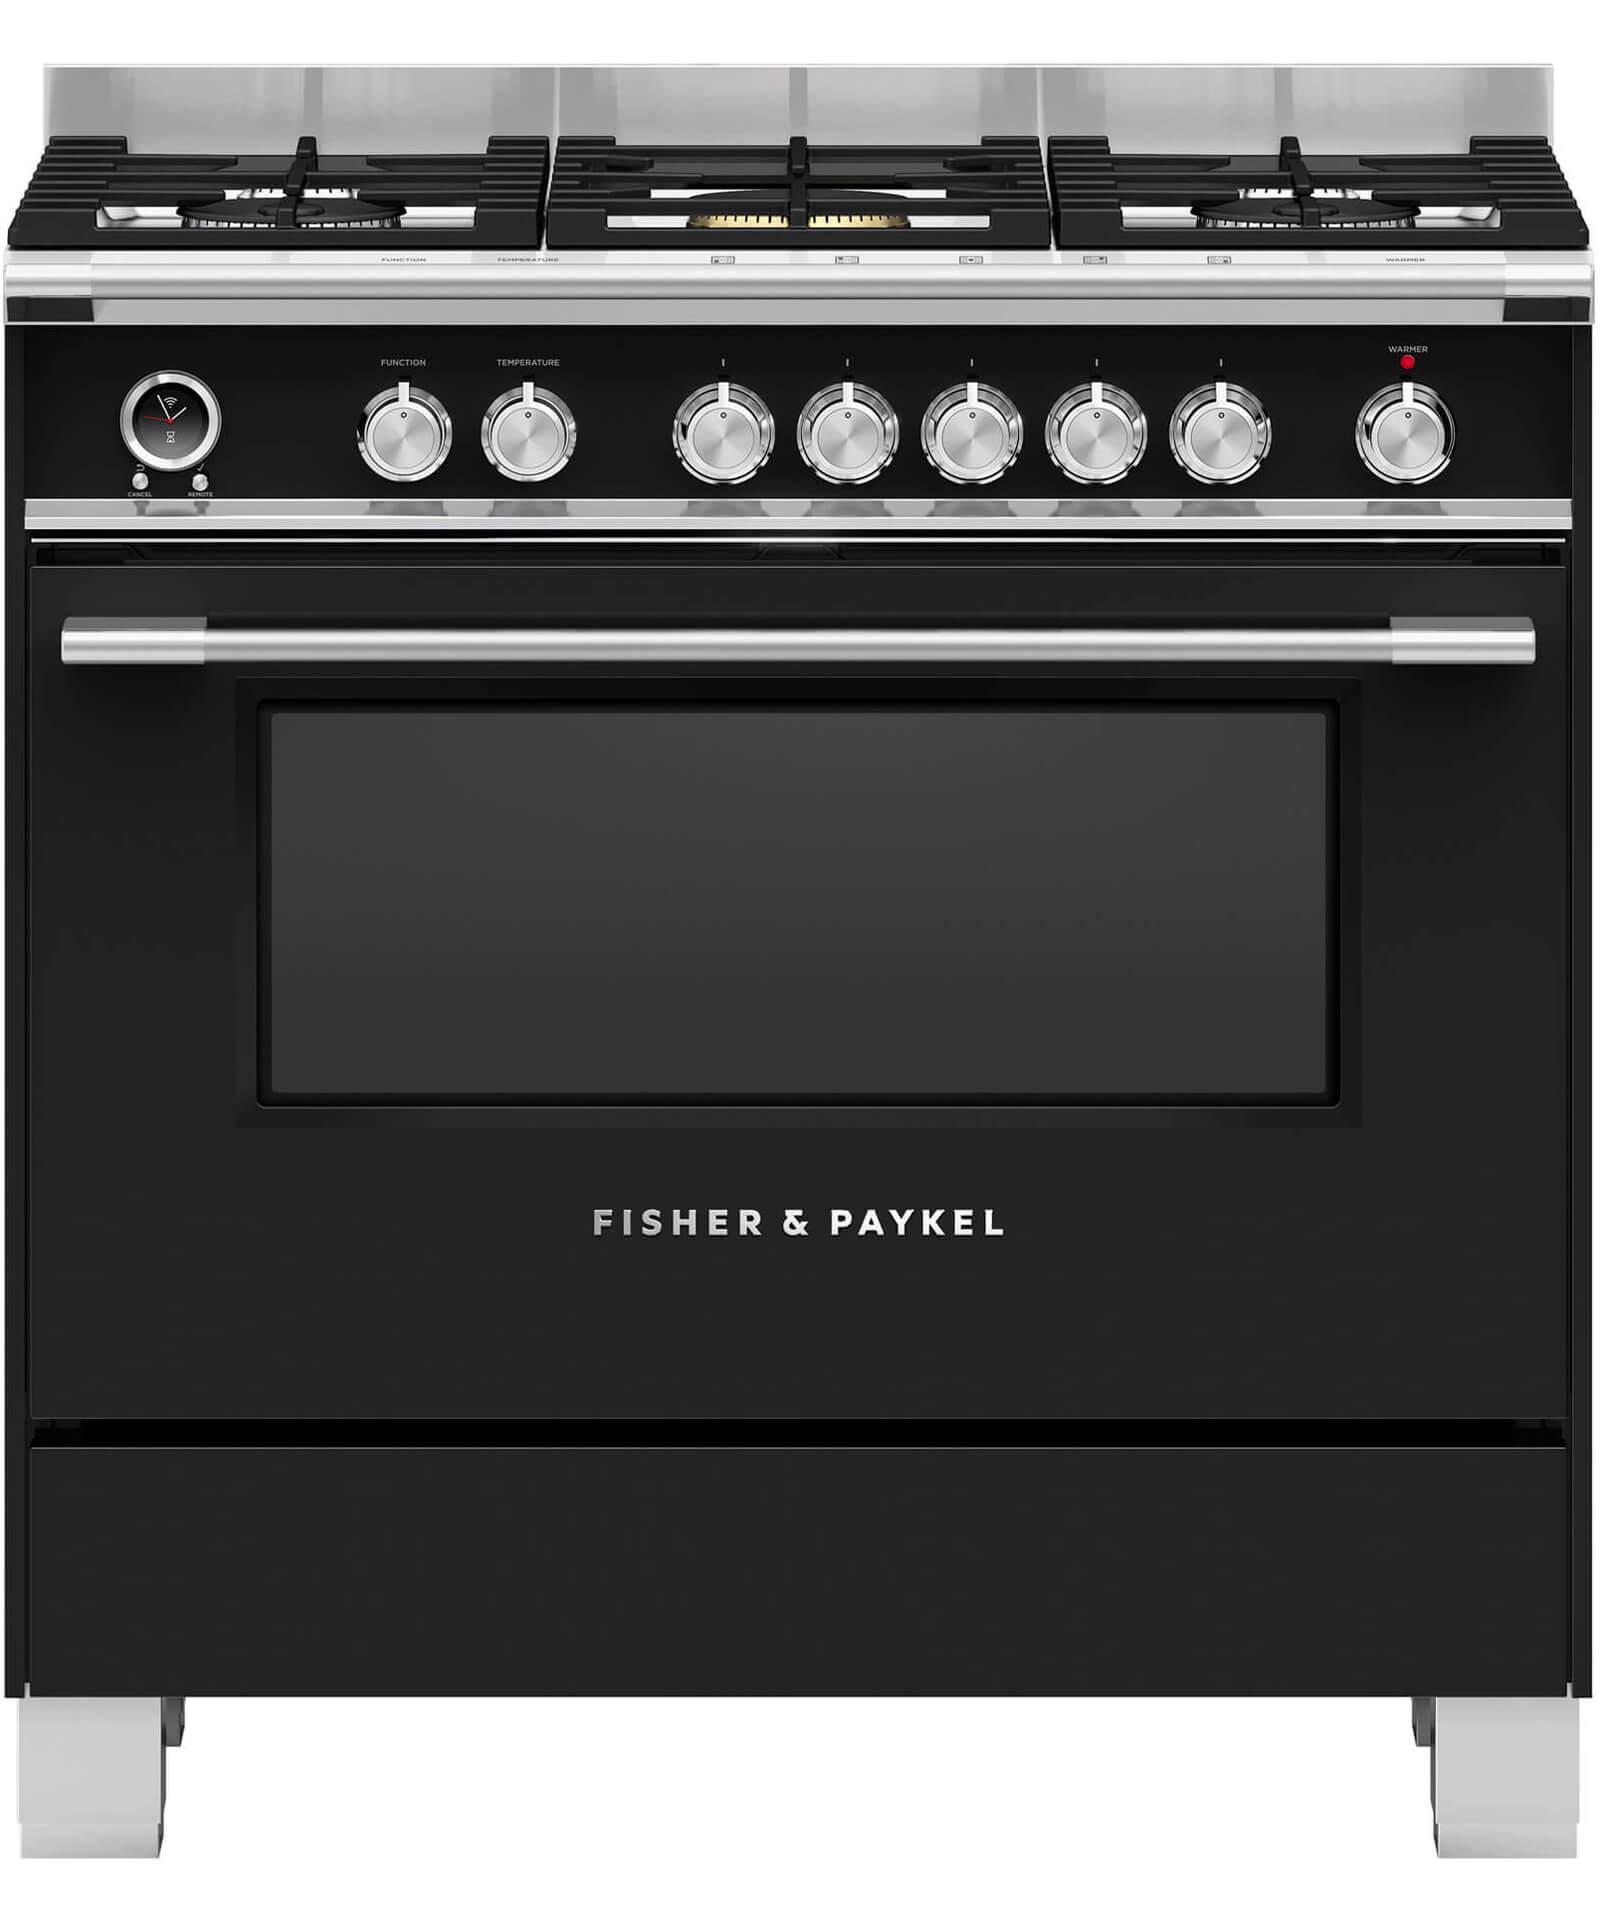 Or90scg6b1 Freestanding Dual Fuel Cooker 90cm Fisher